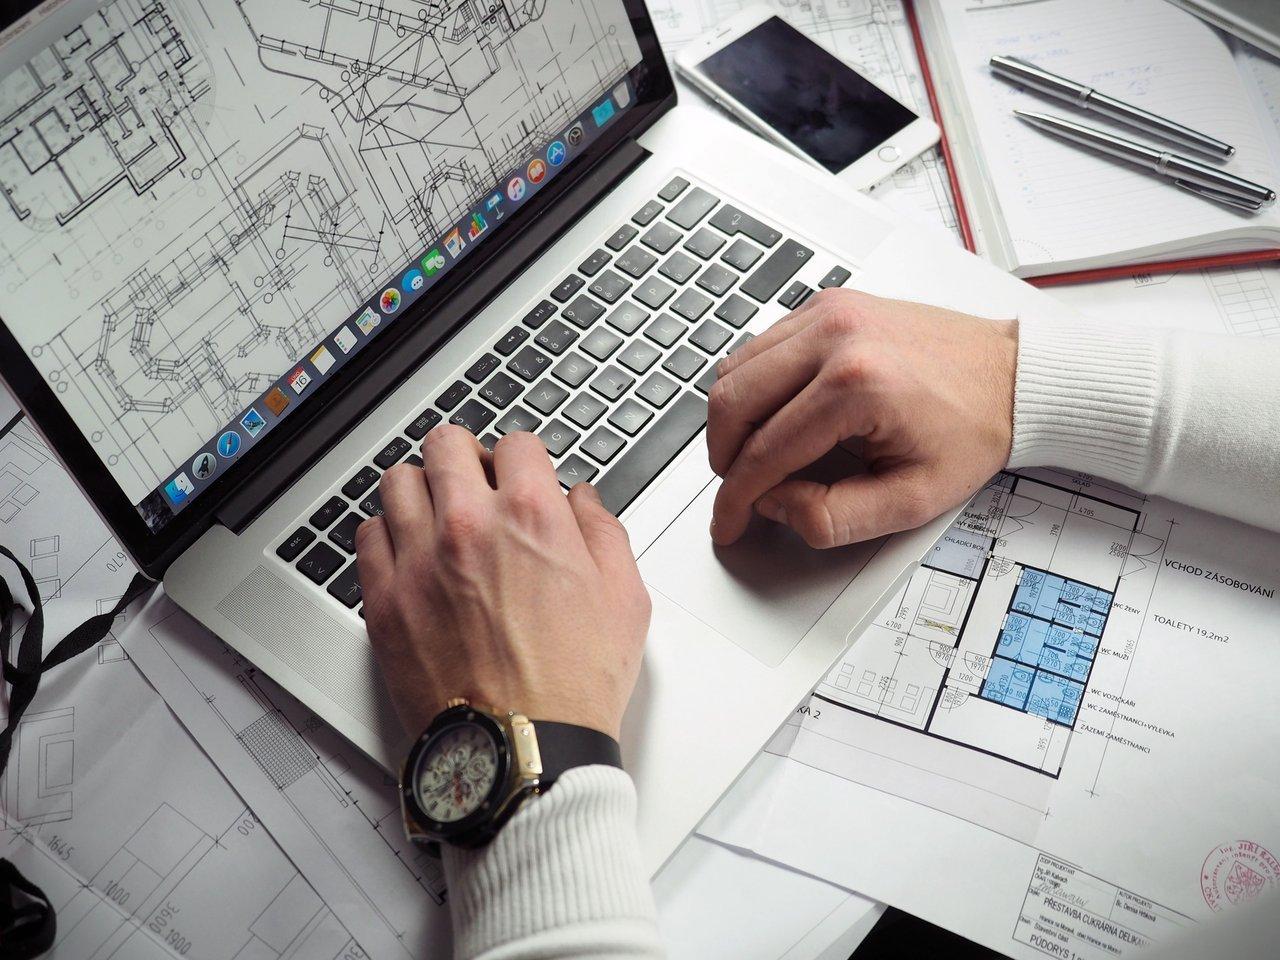 facility manager looking at visual data on computer